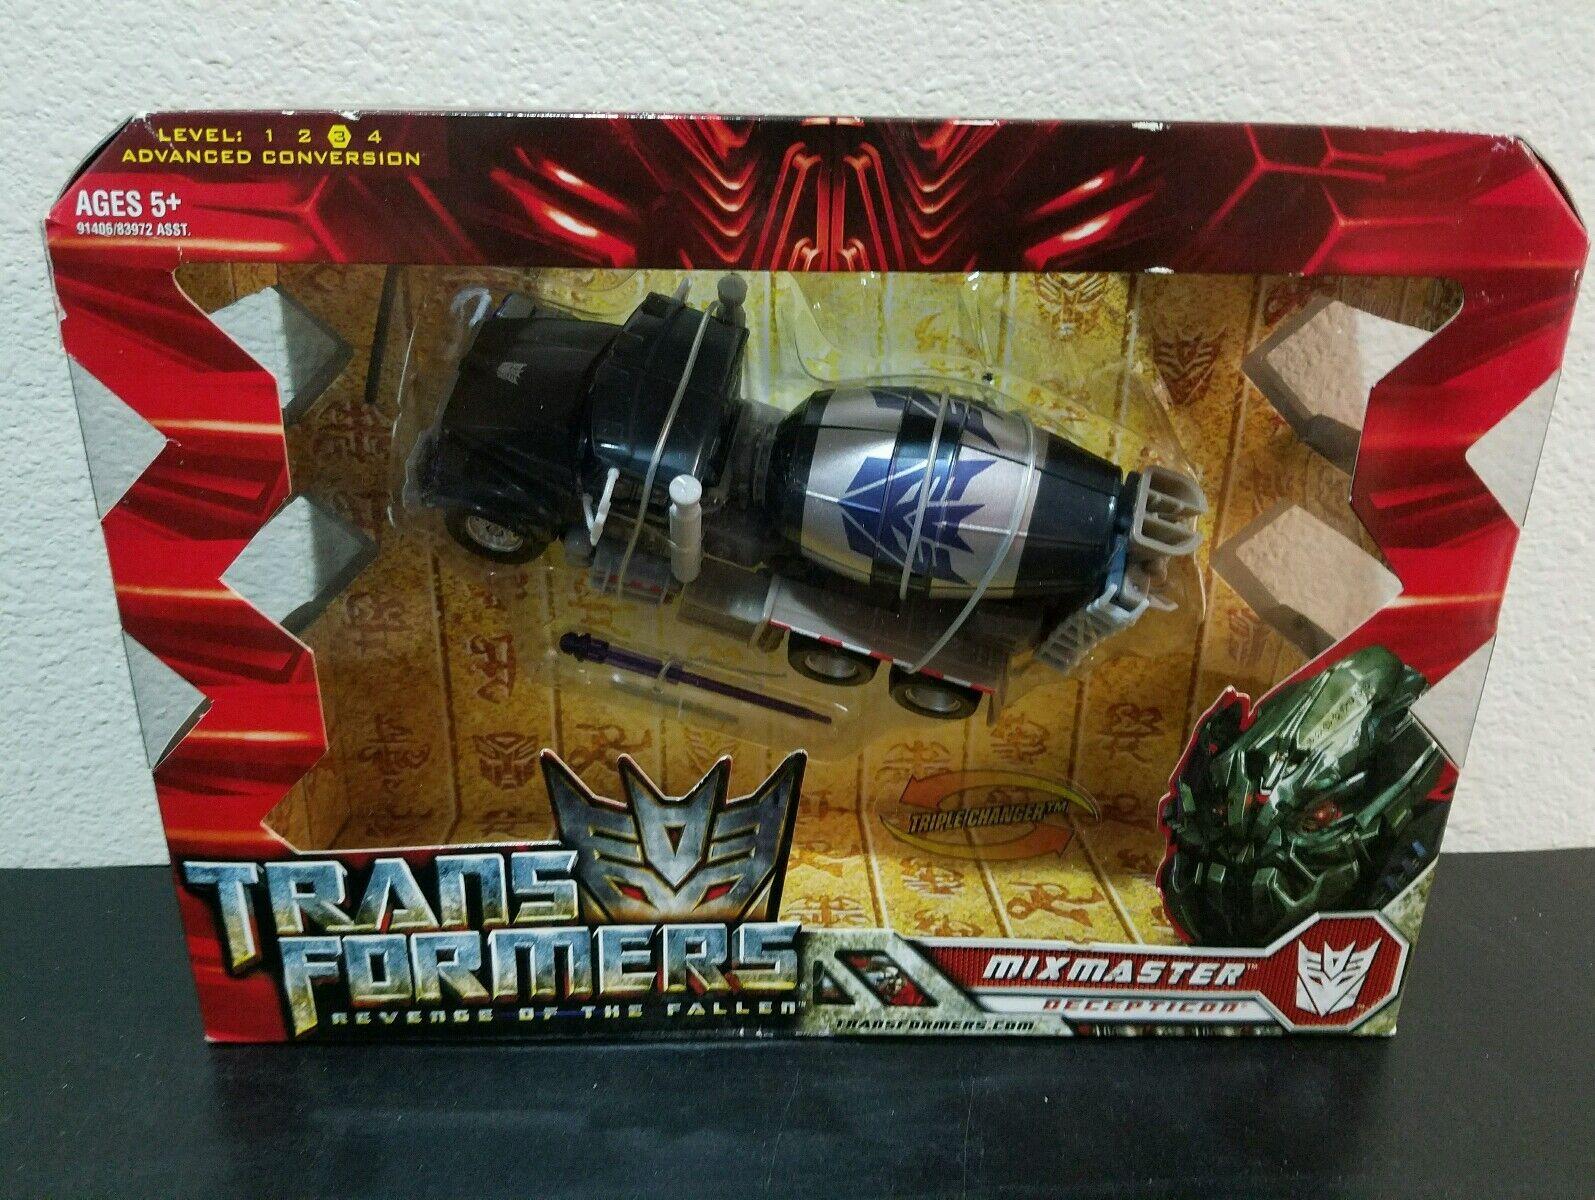 Transformers Mixmaster Revenge of the Fallen - NEW - RARE MISB